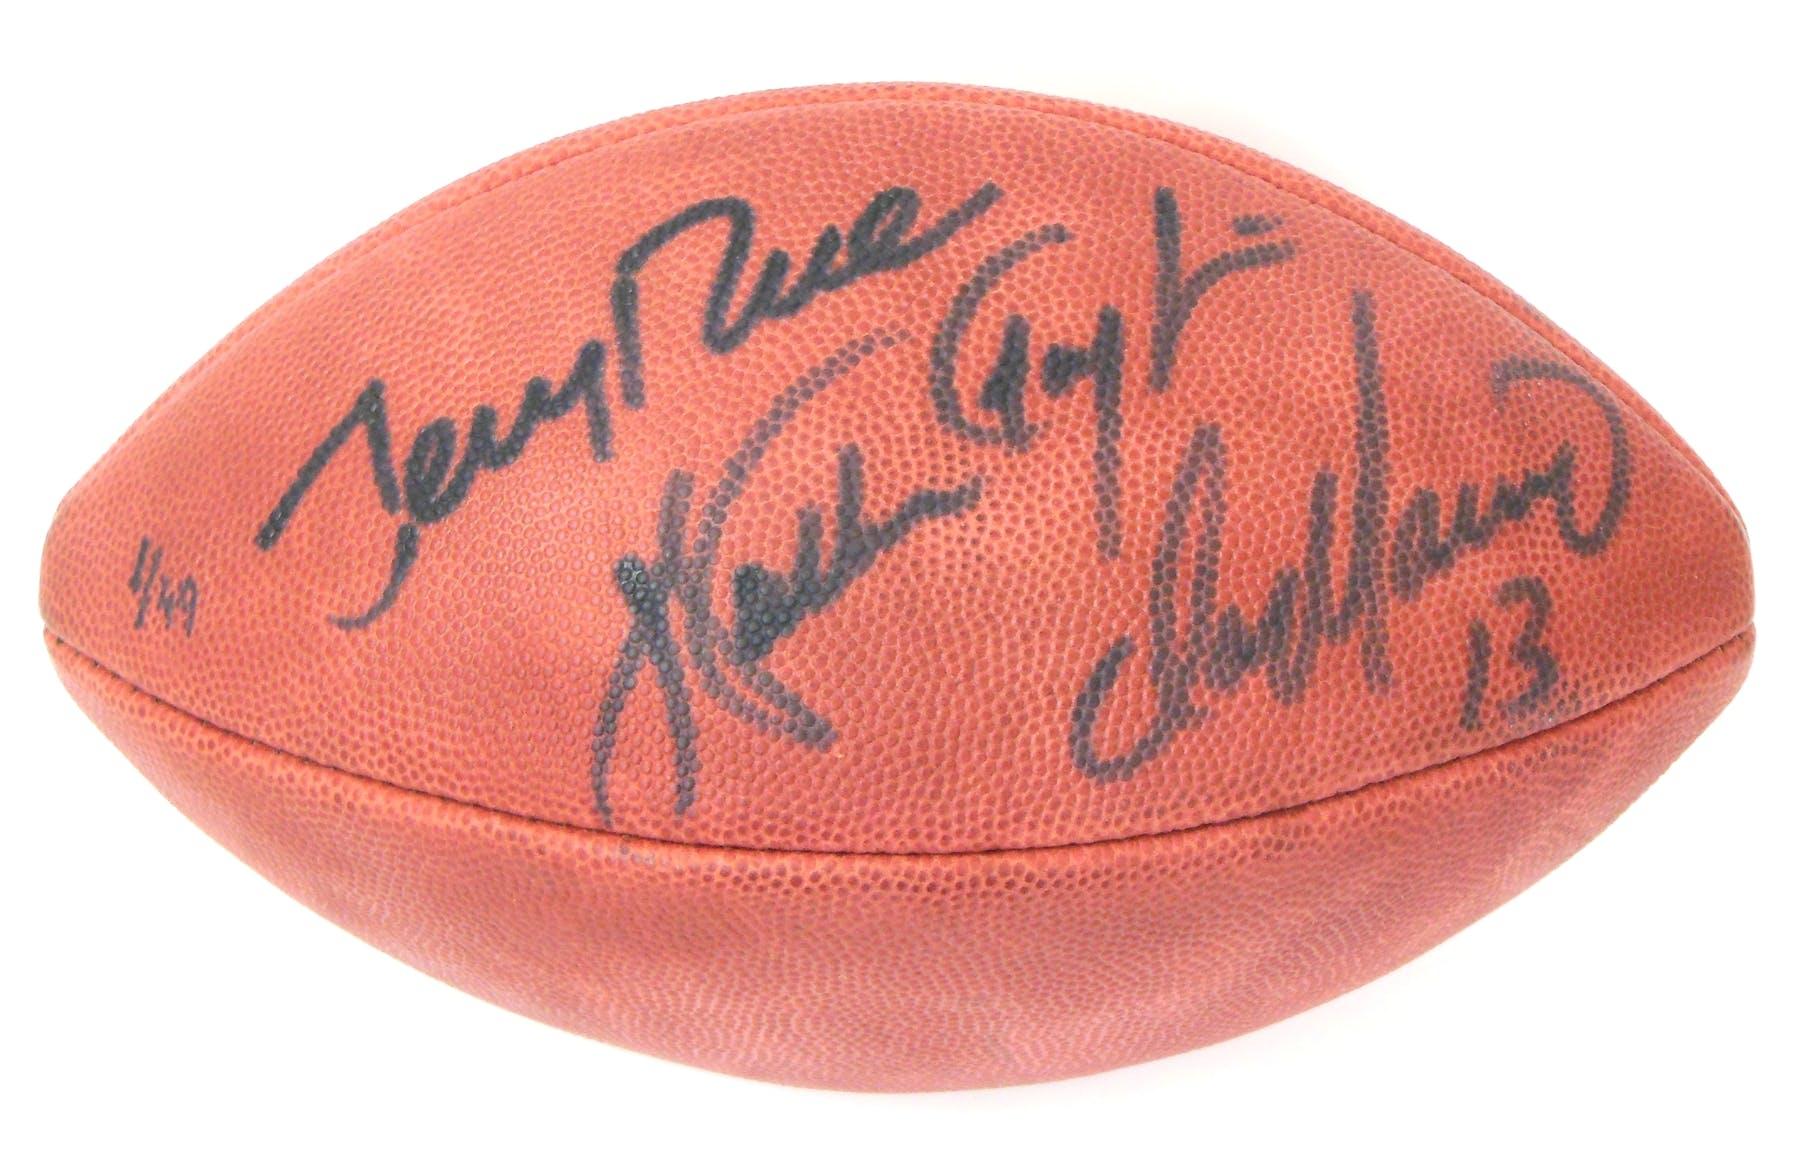 Walter Payton   Dan Marino   Jerry Rice Autographed Wilson Football ... 7e97f946f